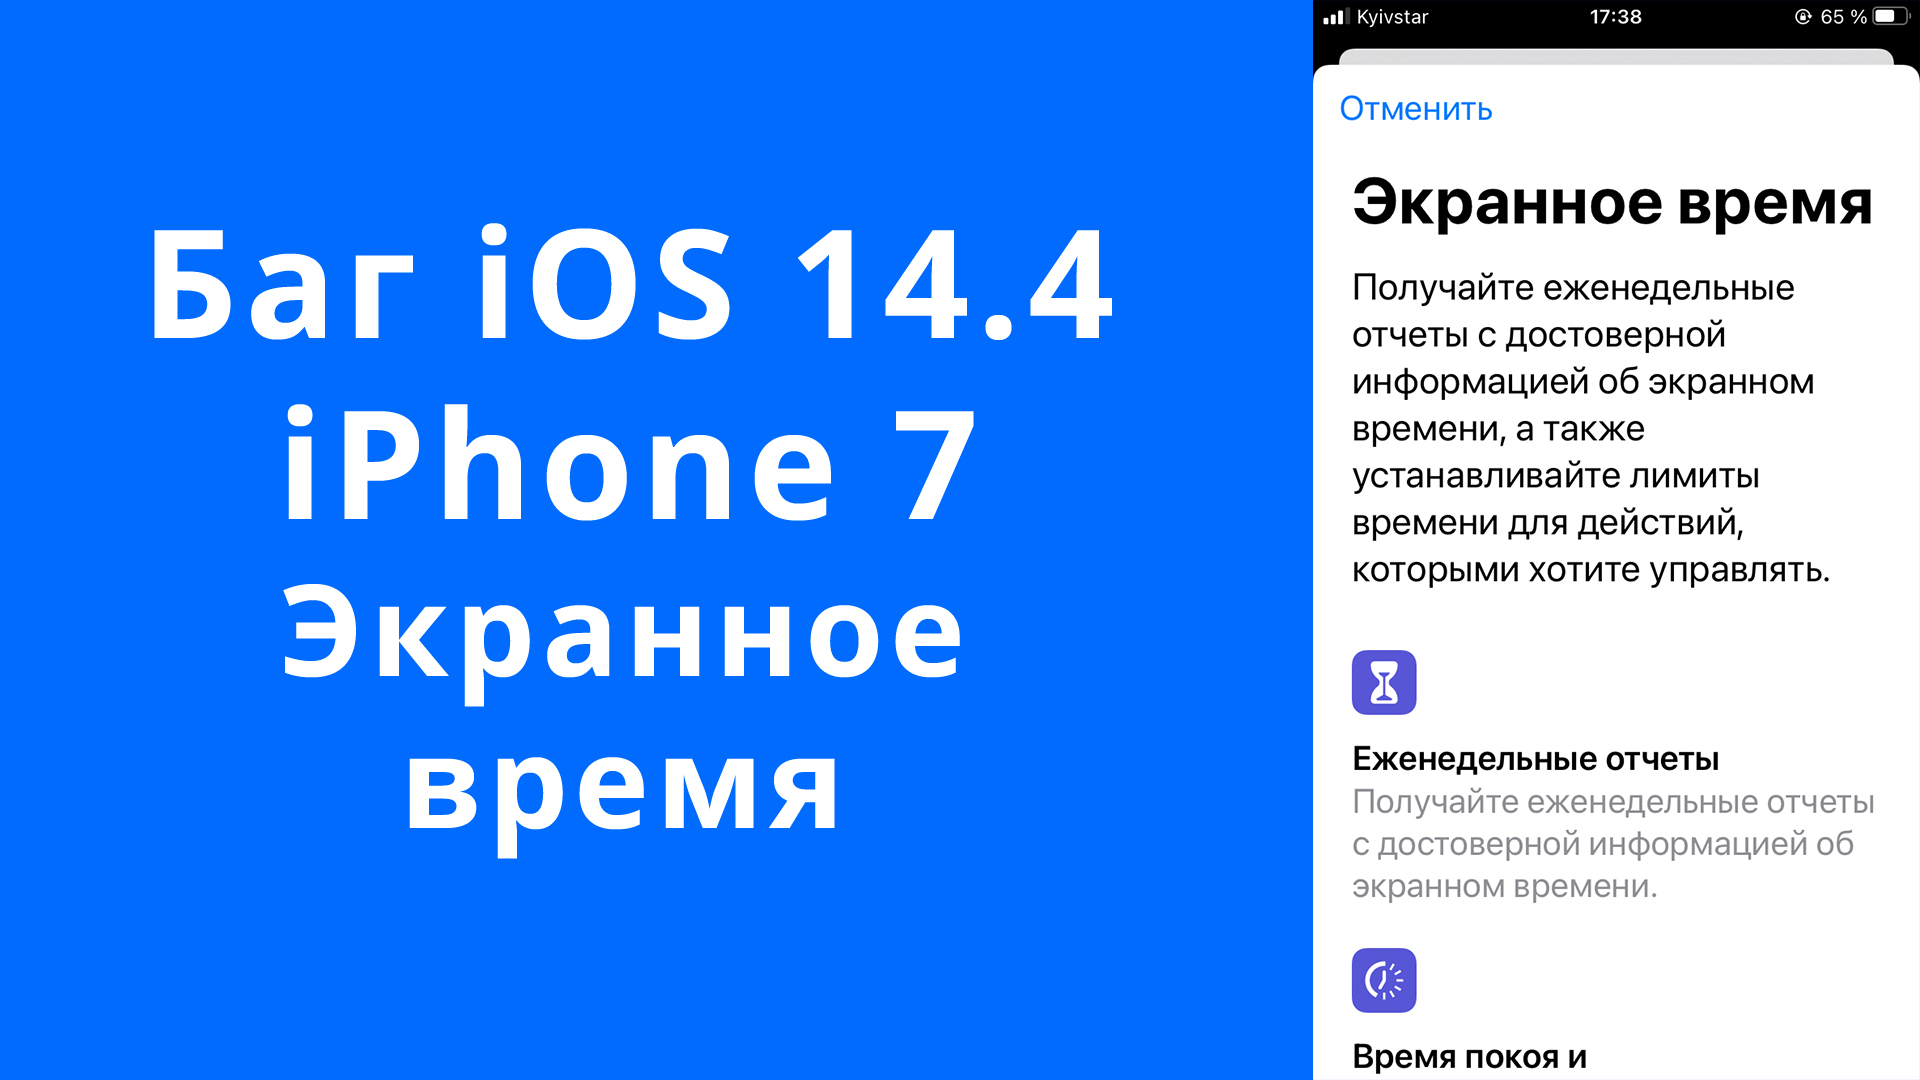 Баг iOS 14.4 экранное время на iPhone 7